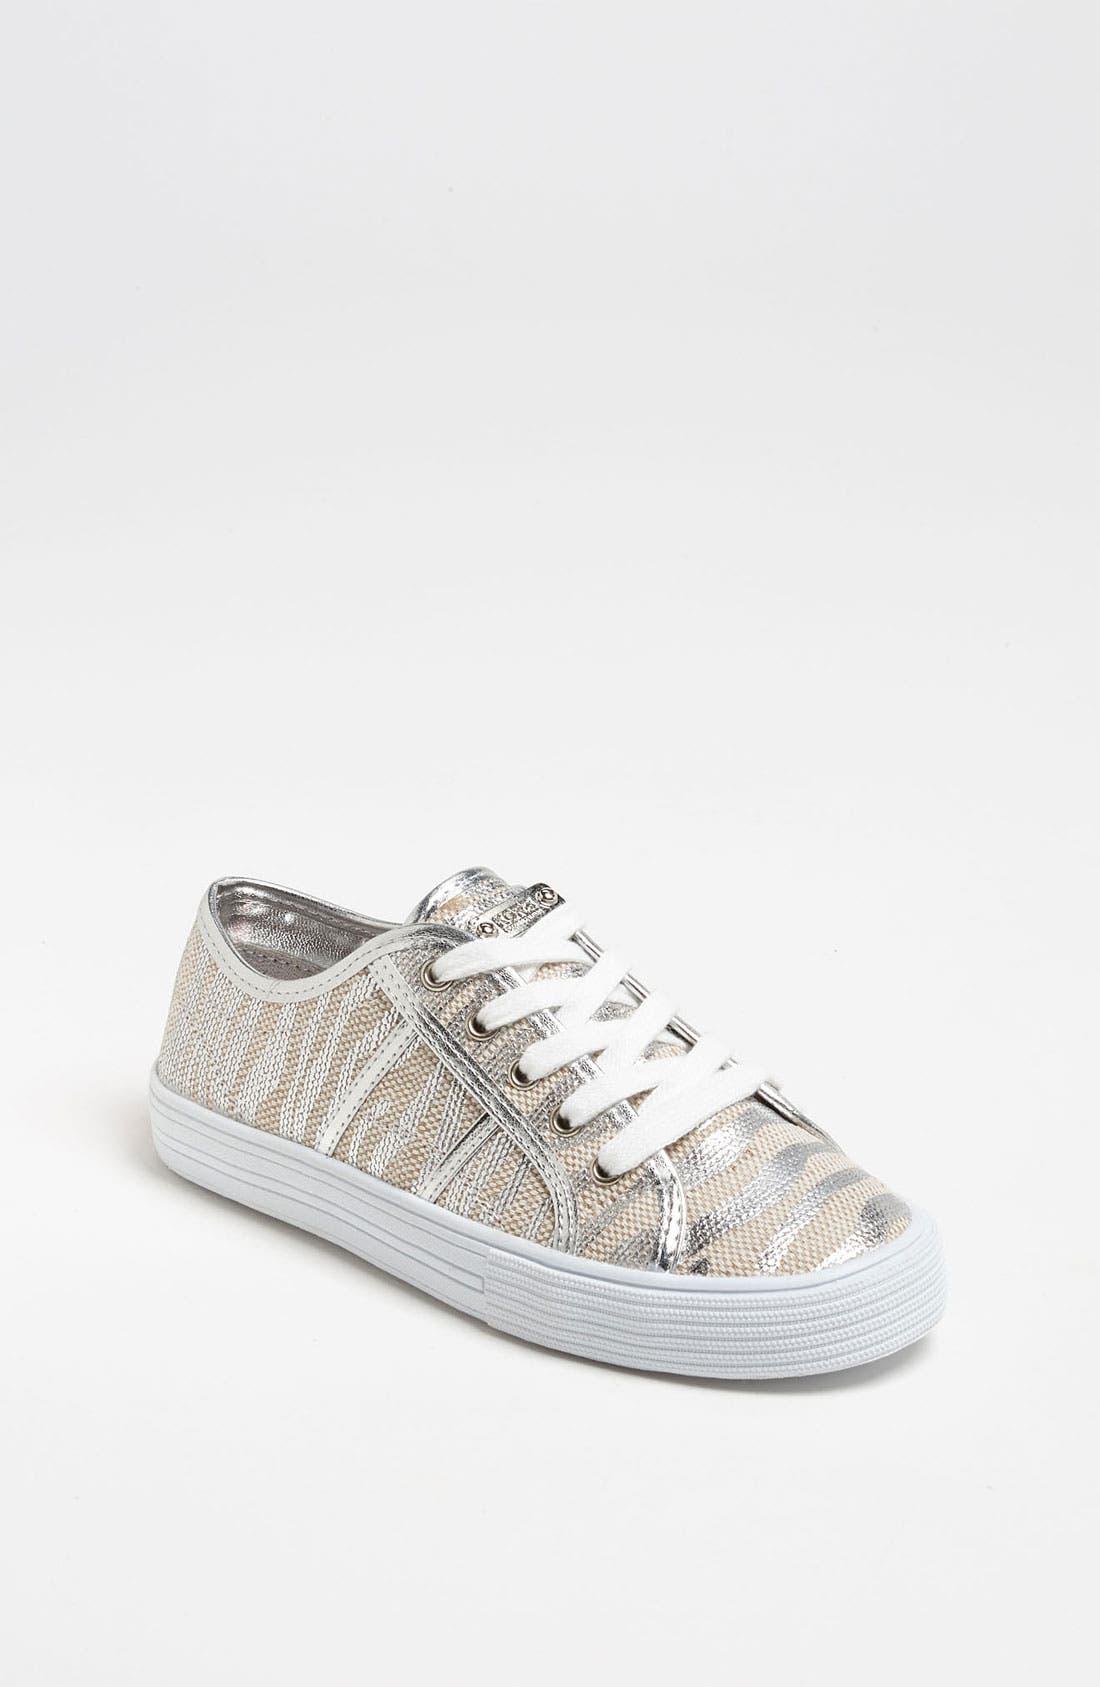 Alternate Image 1 Selected - KORS Michael Kors 'Snapdragon' Sneaker (Toddler, Little Kid & Big Kid)